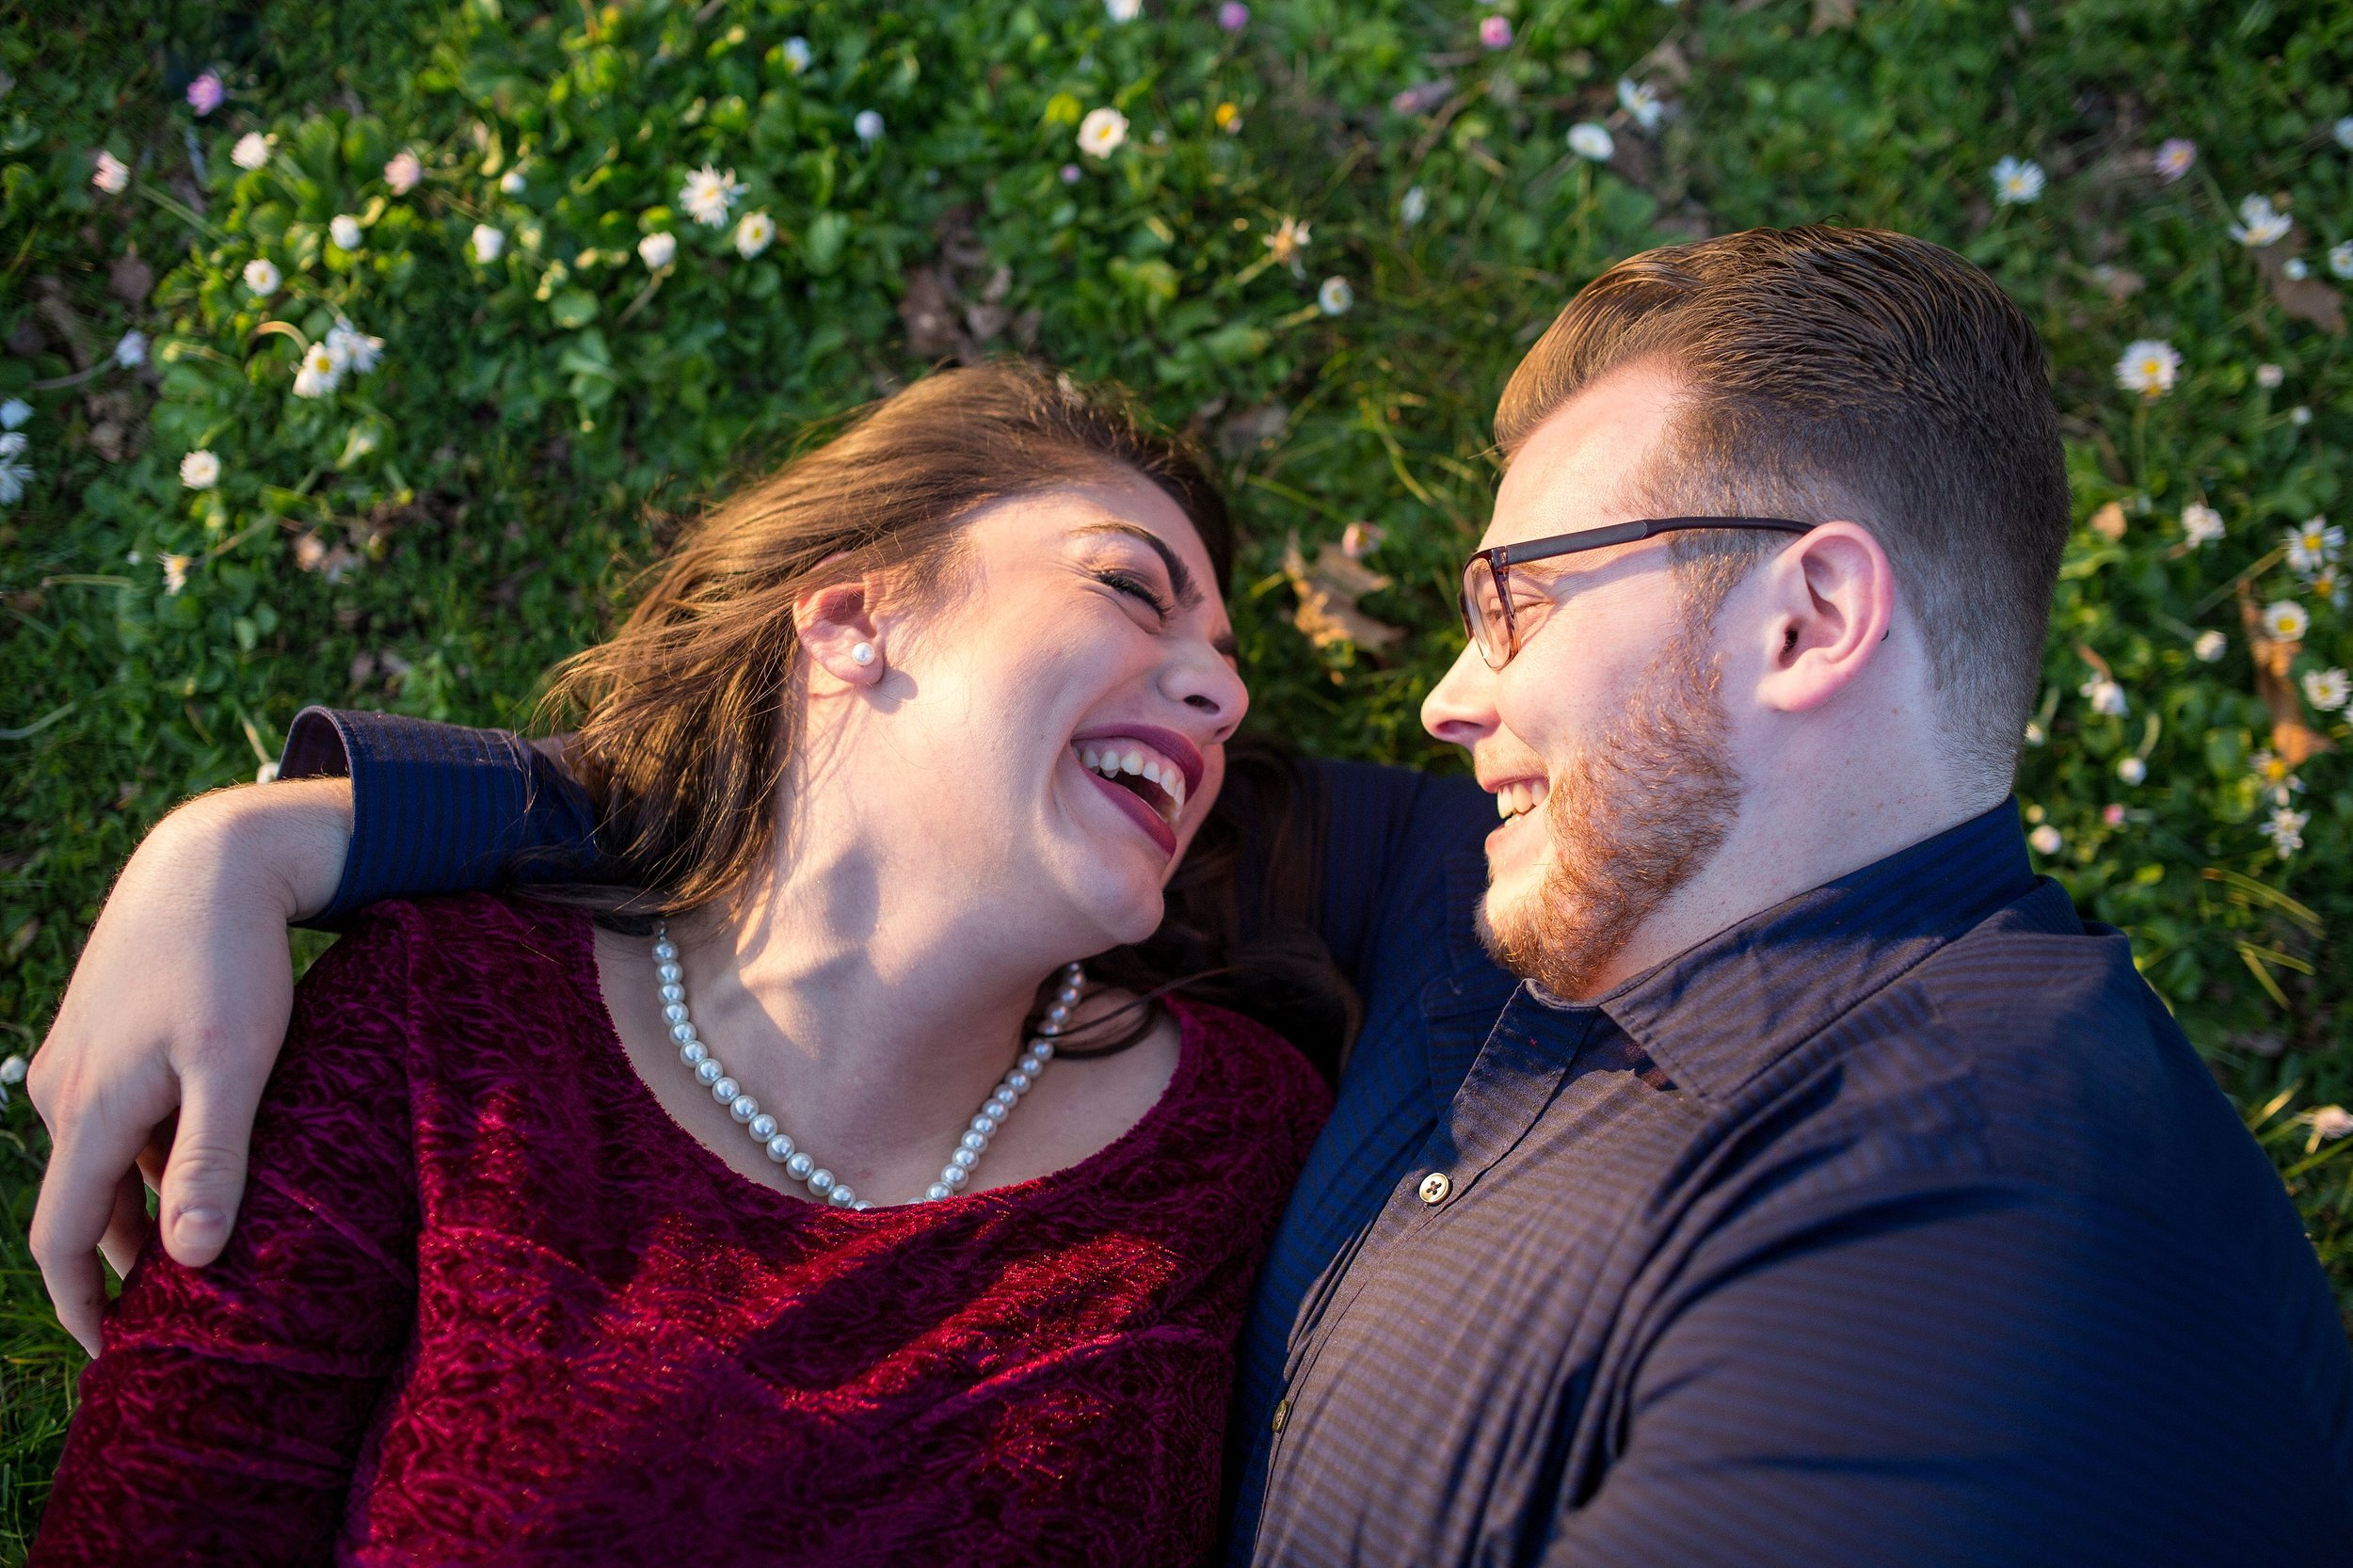 Salem_Oregon_Engagement_Photographer_015.jpg